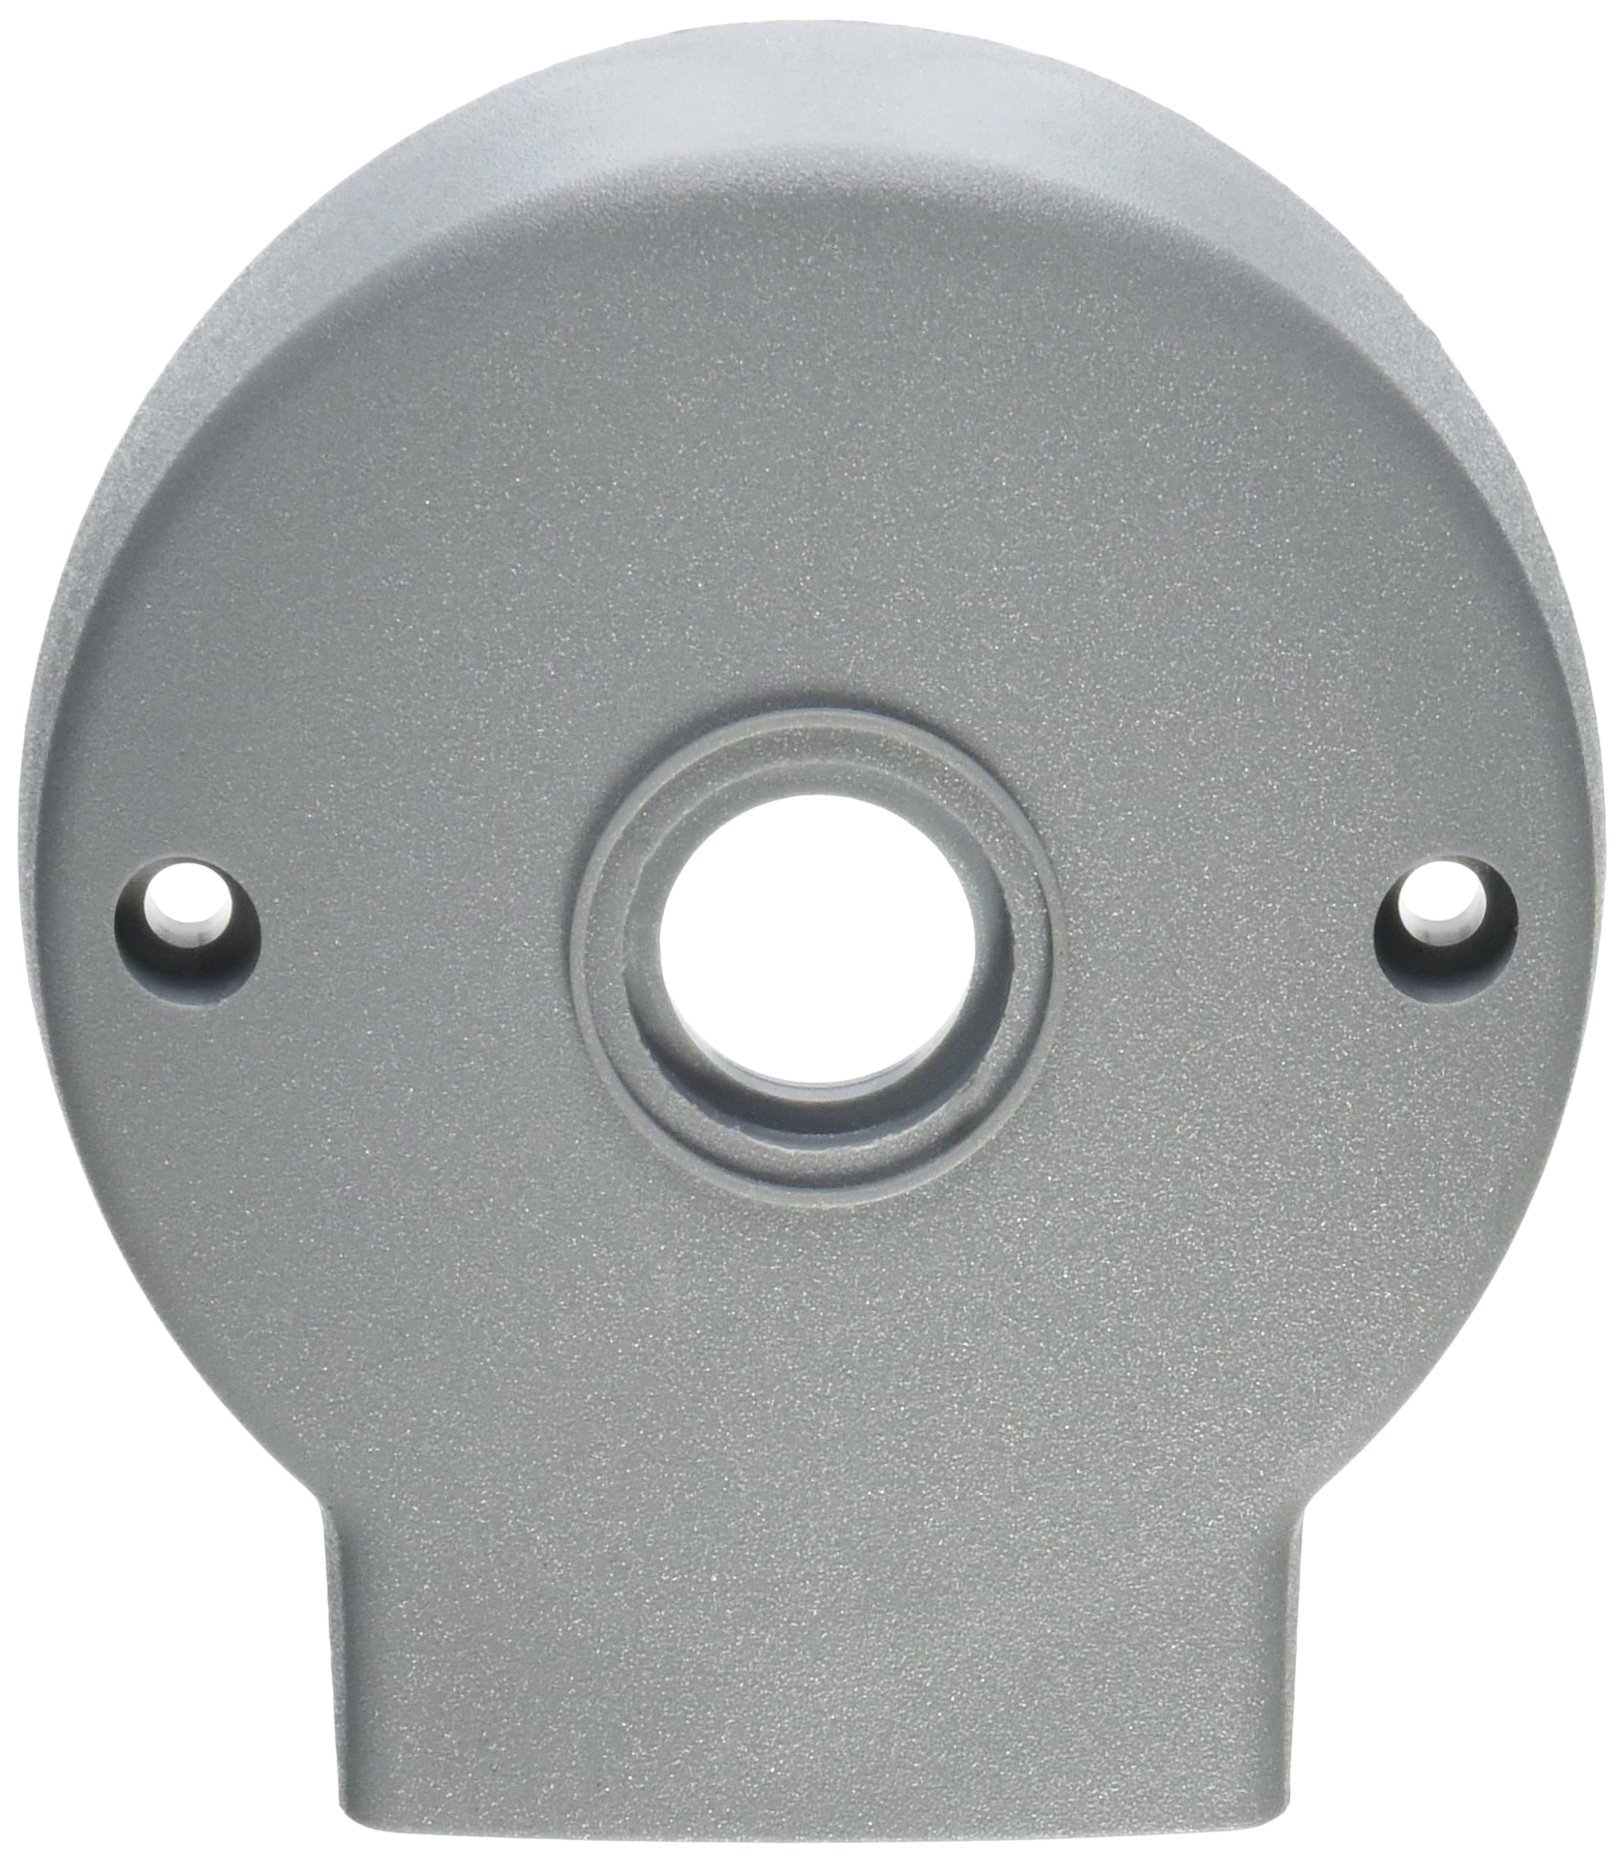 Hoffman S2MLSAR Light Signal Adapter, Round Cover